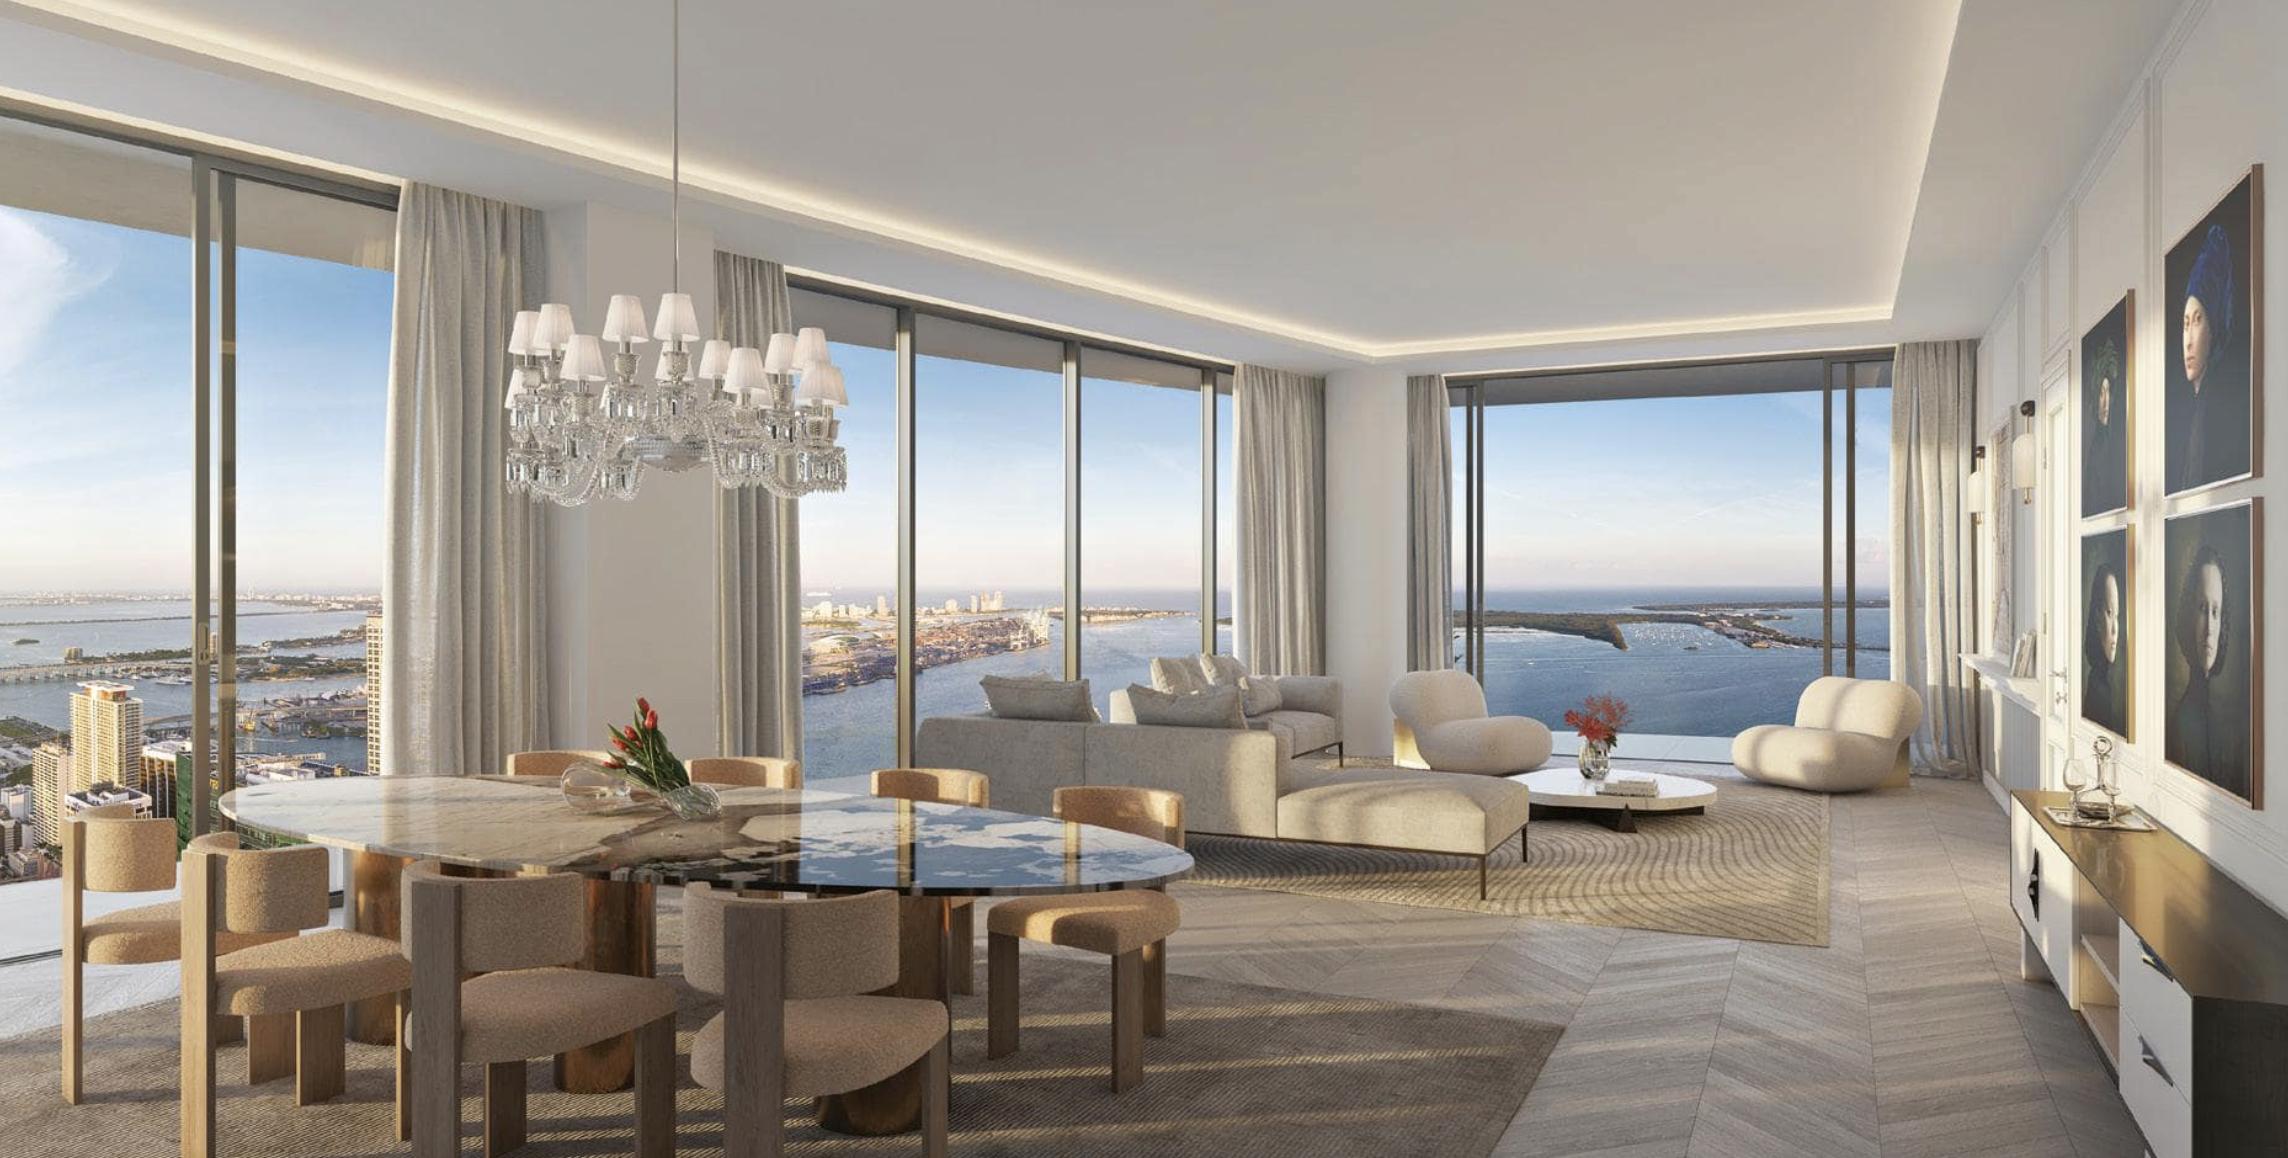 Living Room. Designed by Meyers Davis Studio.